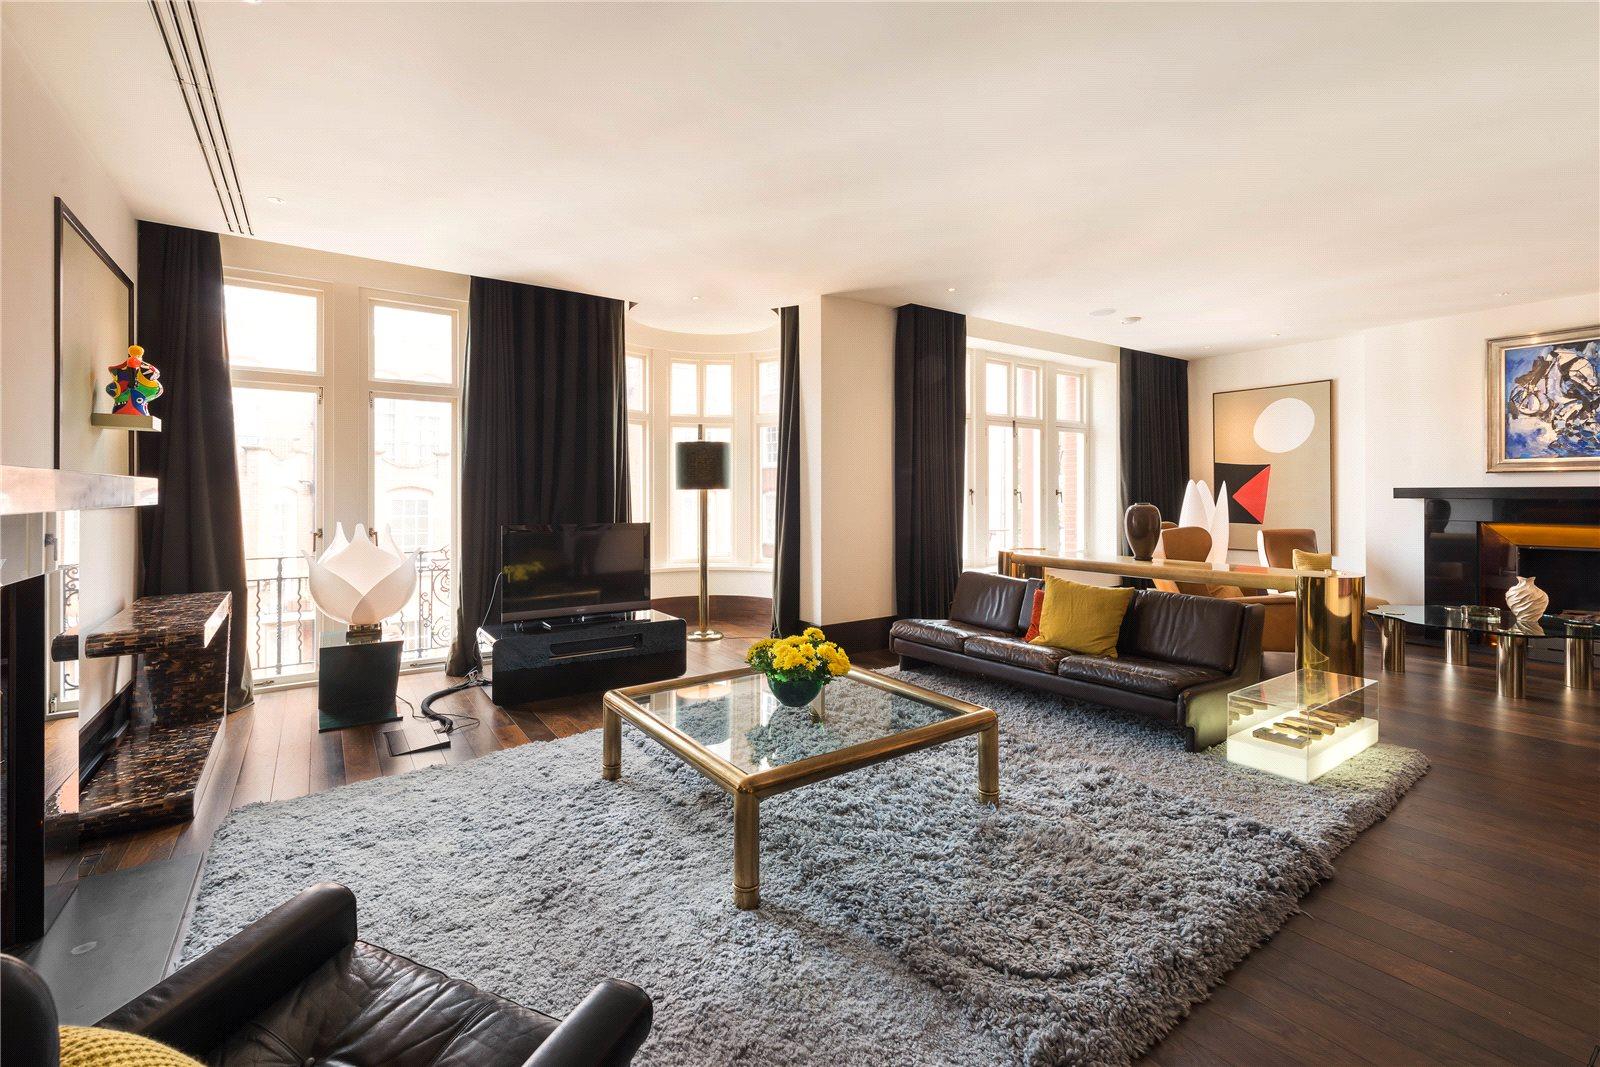 Apartamentos para Venda às Prince Edward Mansions, Hereford Road, London, W2 London, Inglaterra